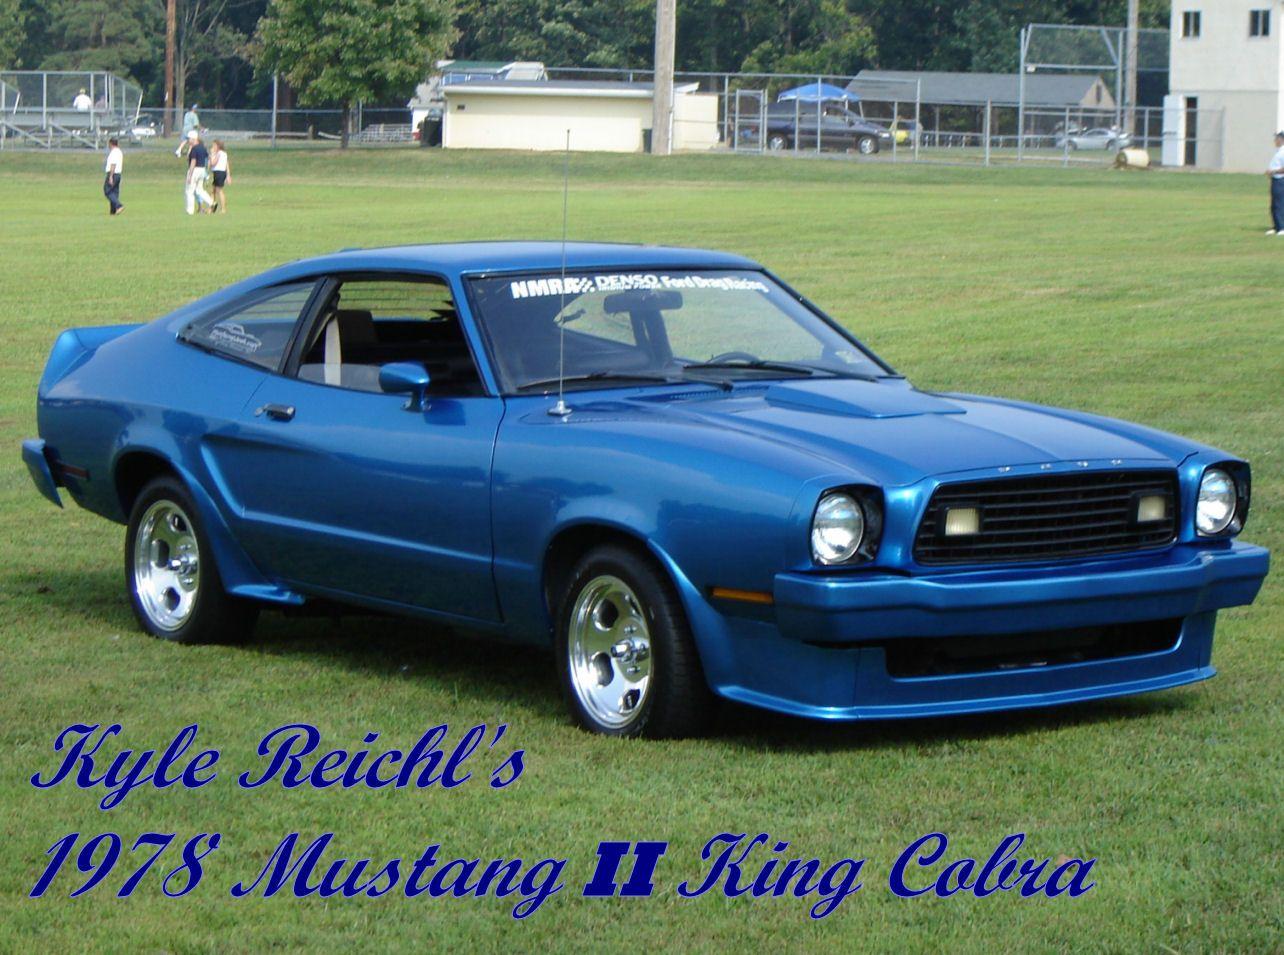 1978 ford mustang ii king cobra cars trucks pinterest king cobra king and ford mustangs. Black Bedroom Furniture Sets. Home Design Ideas